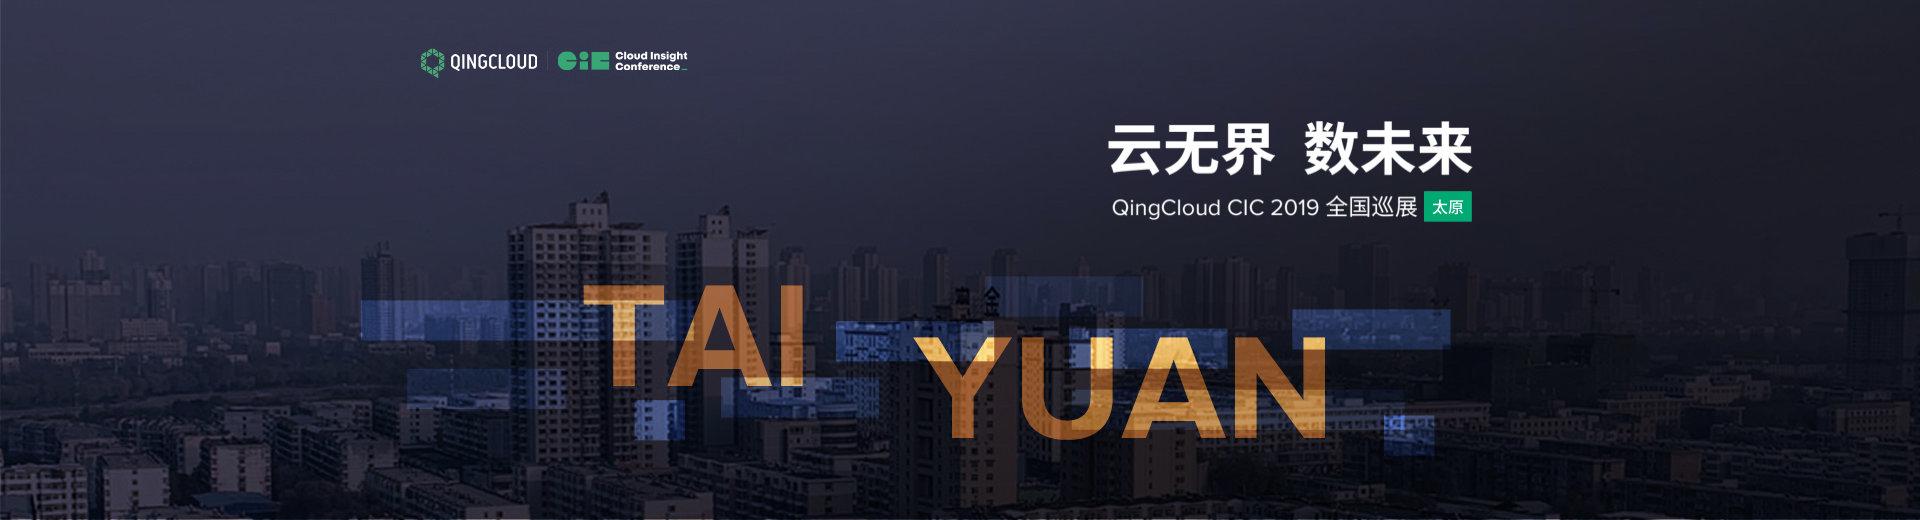 太原站 — CIC 2019 青云QingCloud 全国巡展